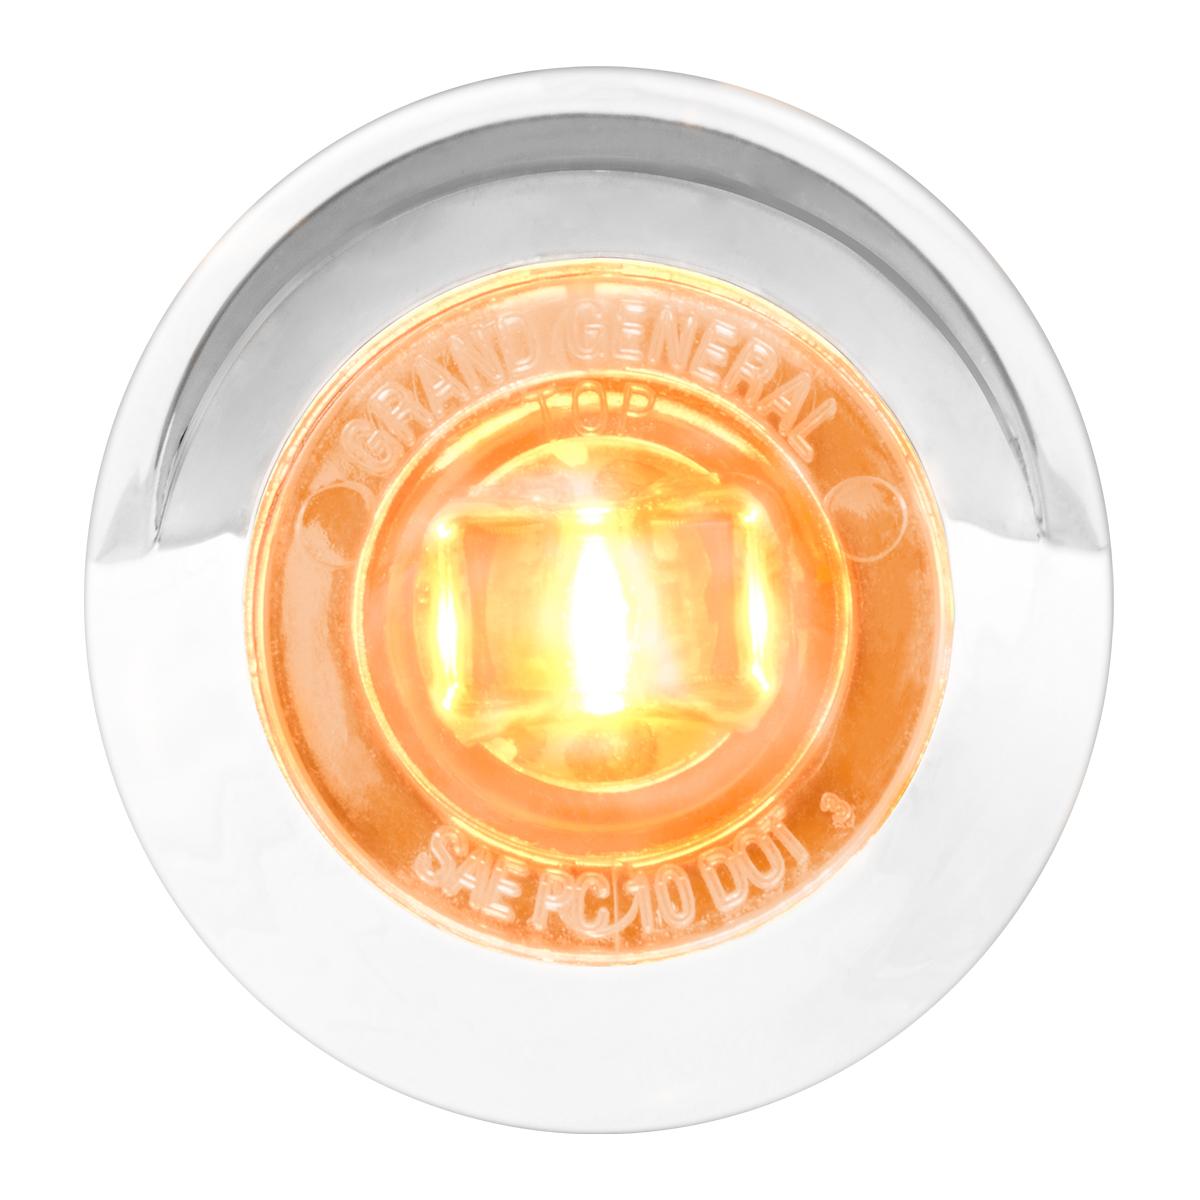 "75231 1-1/4"" Dia. Dual Function LED Light with Chrome Plastic Bezel w/ Visor and Nut"